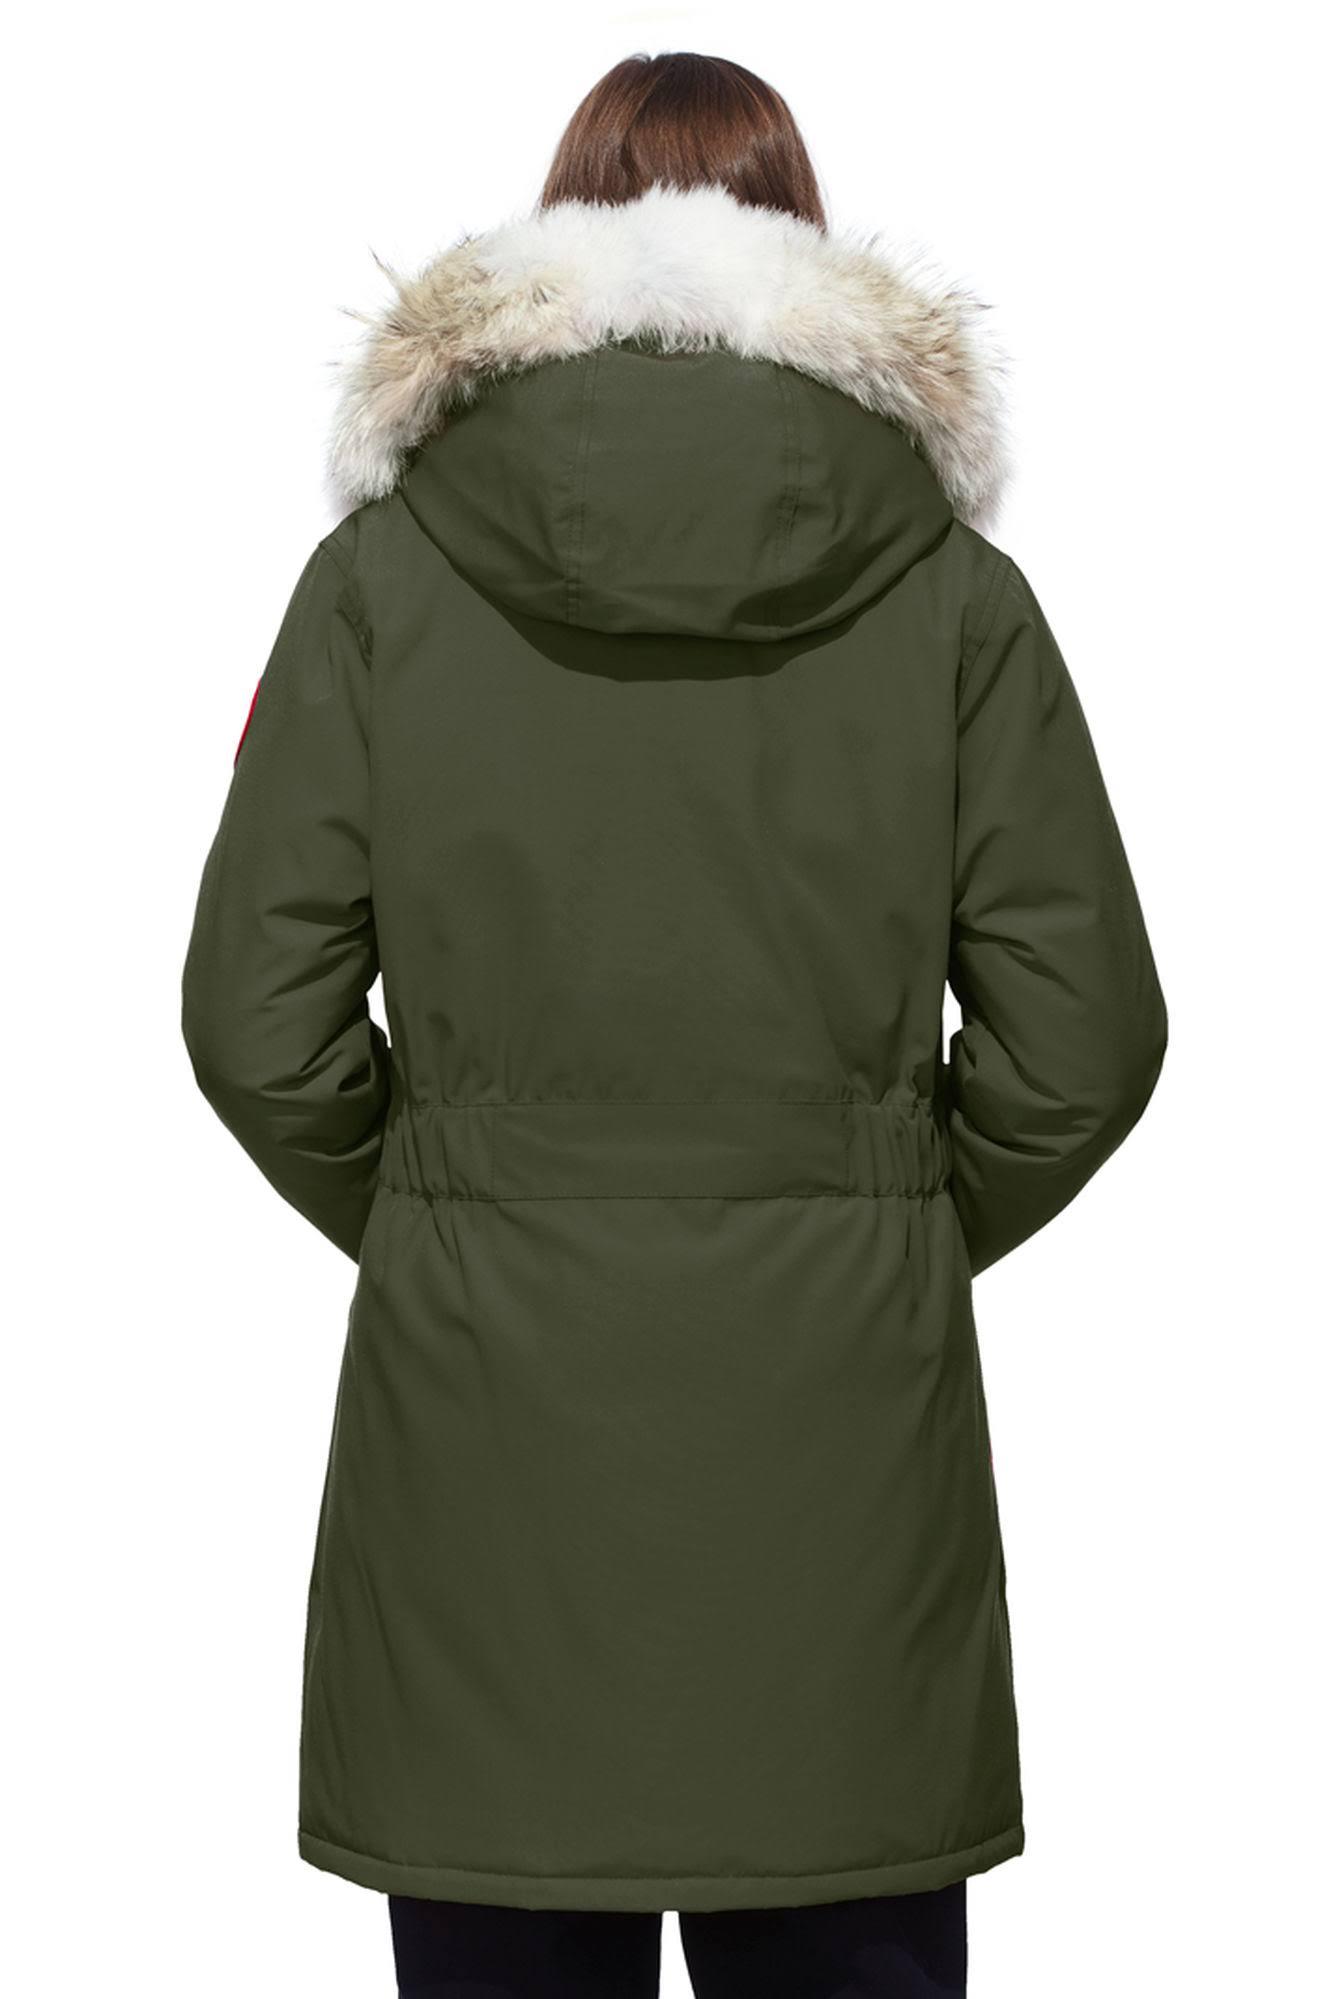 Goose Mujer Trillium Y Ganso Xs Canadá Chaqueta De Piel Capucha Parka Con Verde qaWwwTP8zf